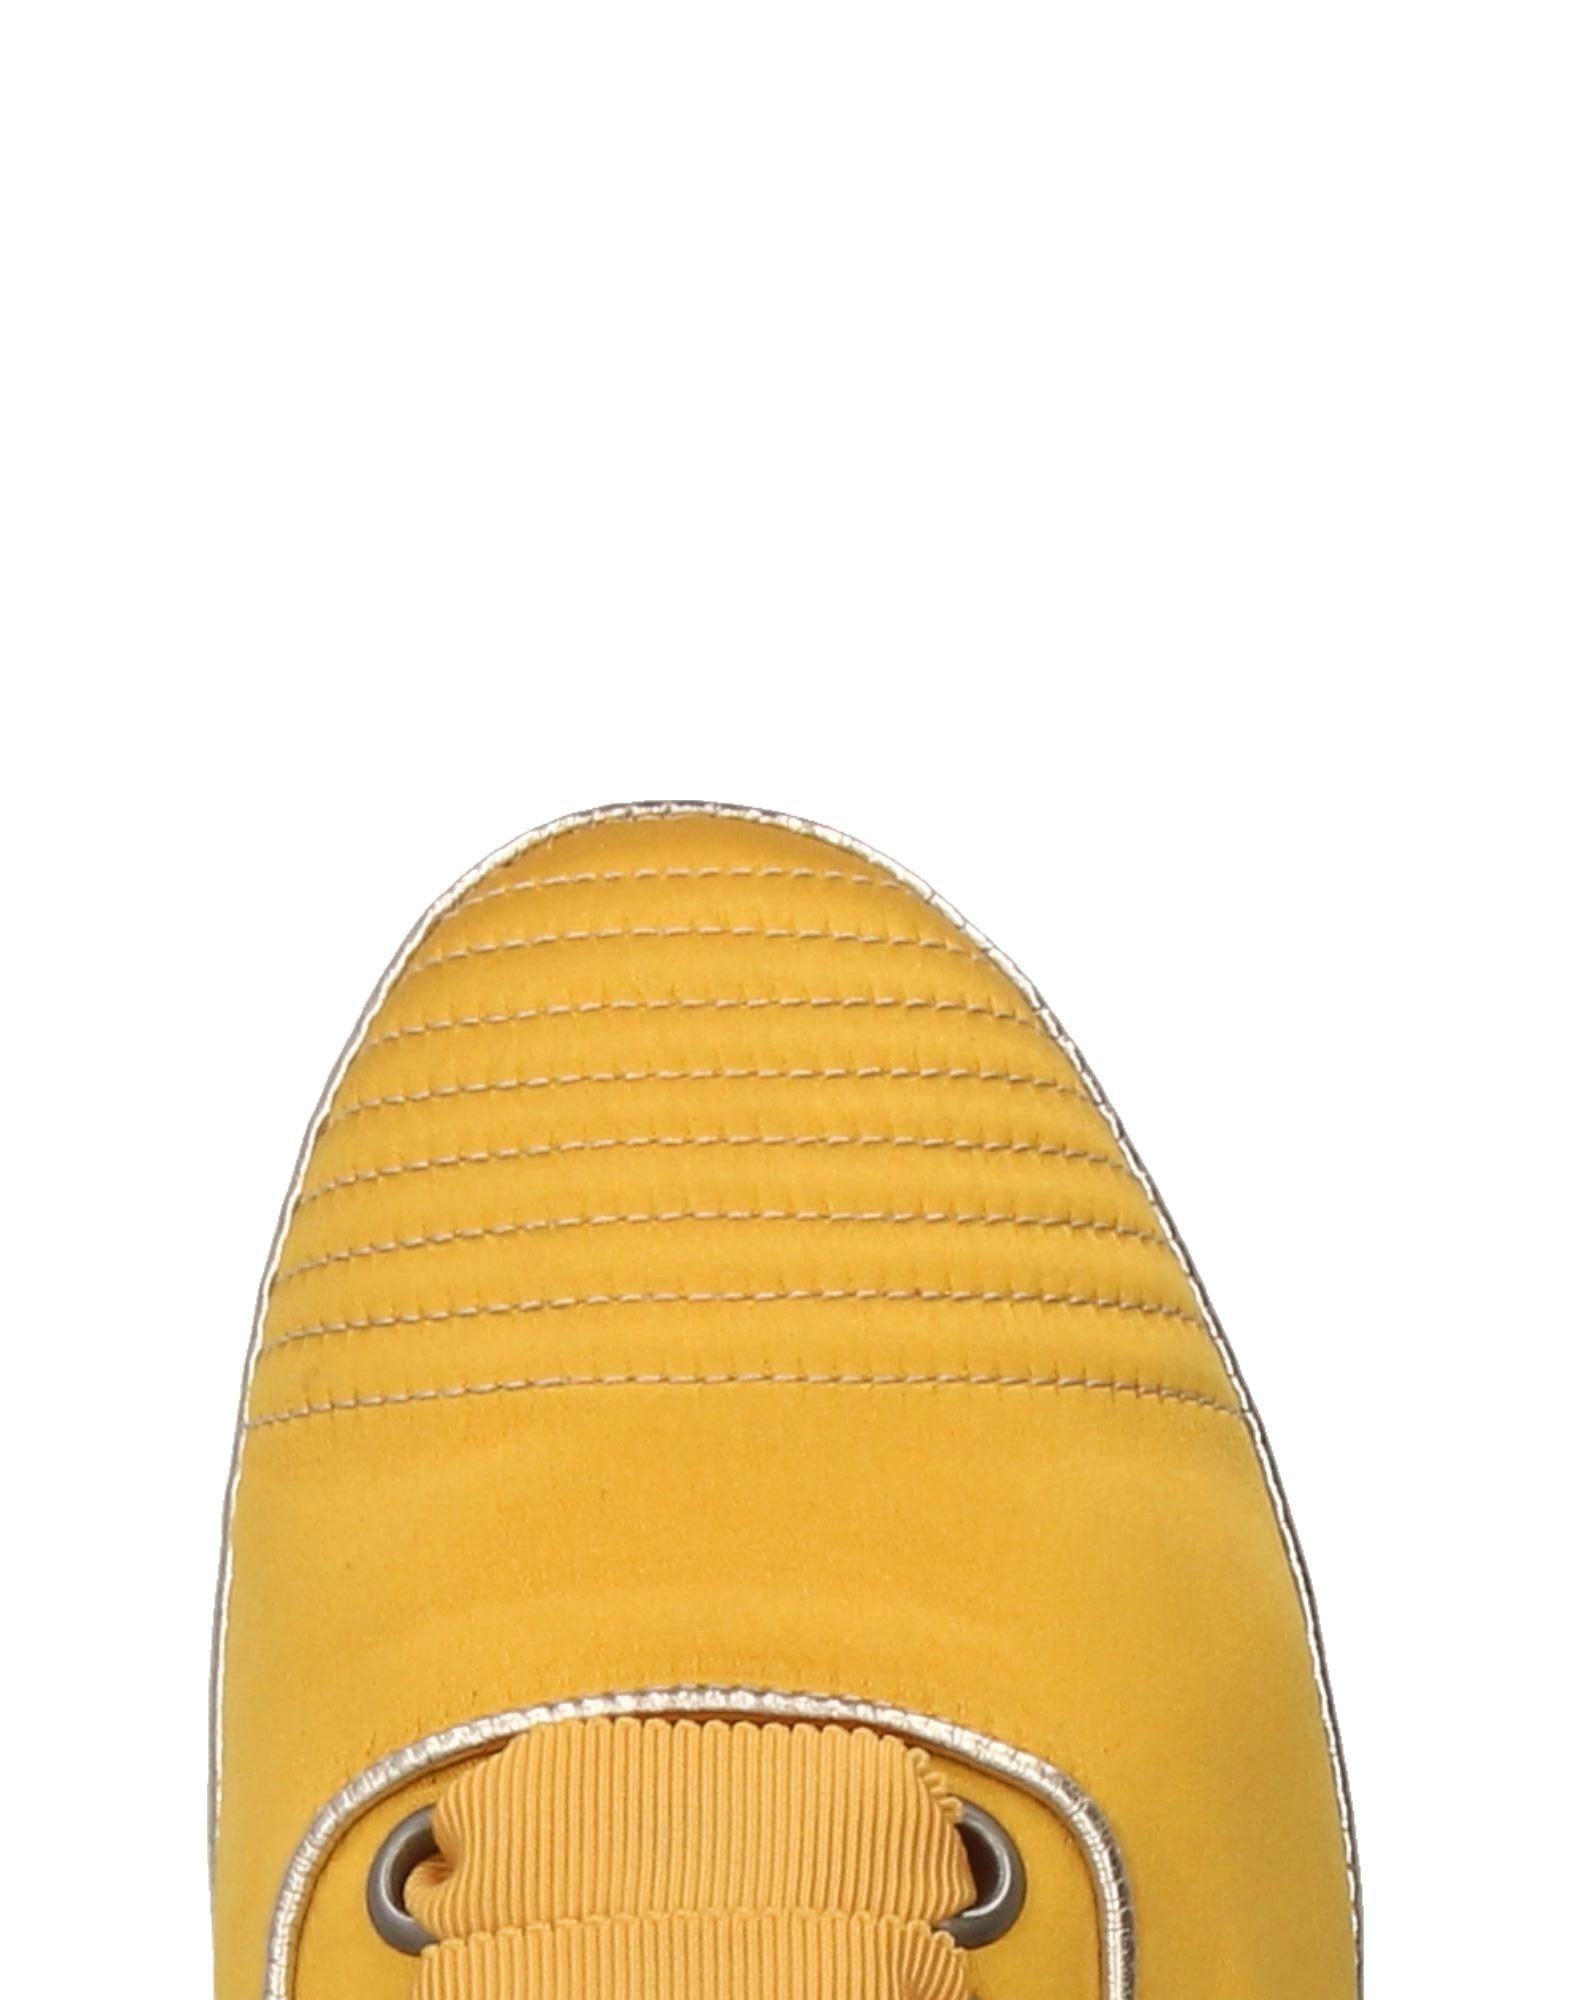 Chaussures À Lacets Sonia Rykiel Femme - Chaussures À Lacets Sonia Rykiel sur